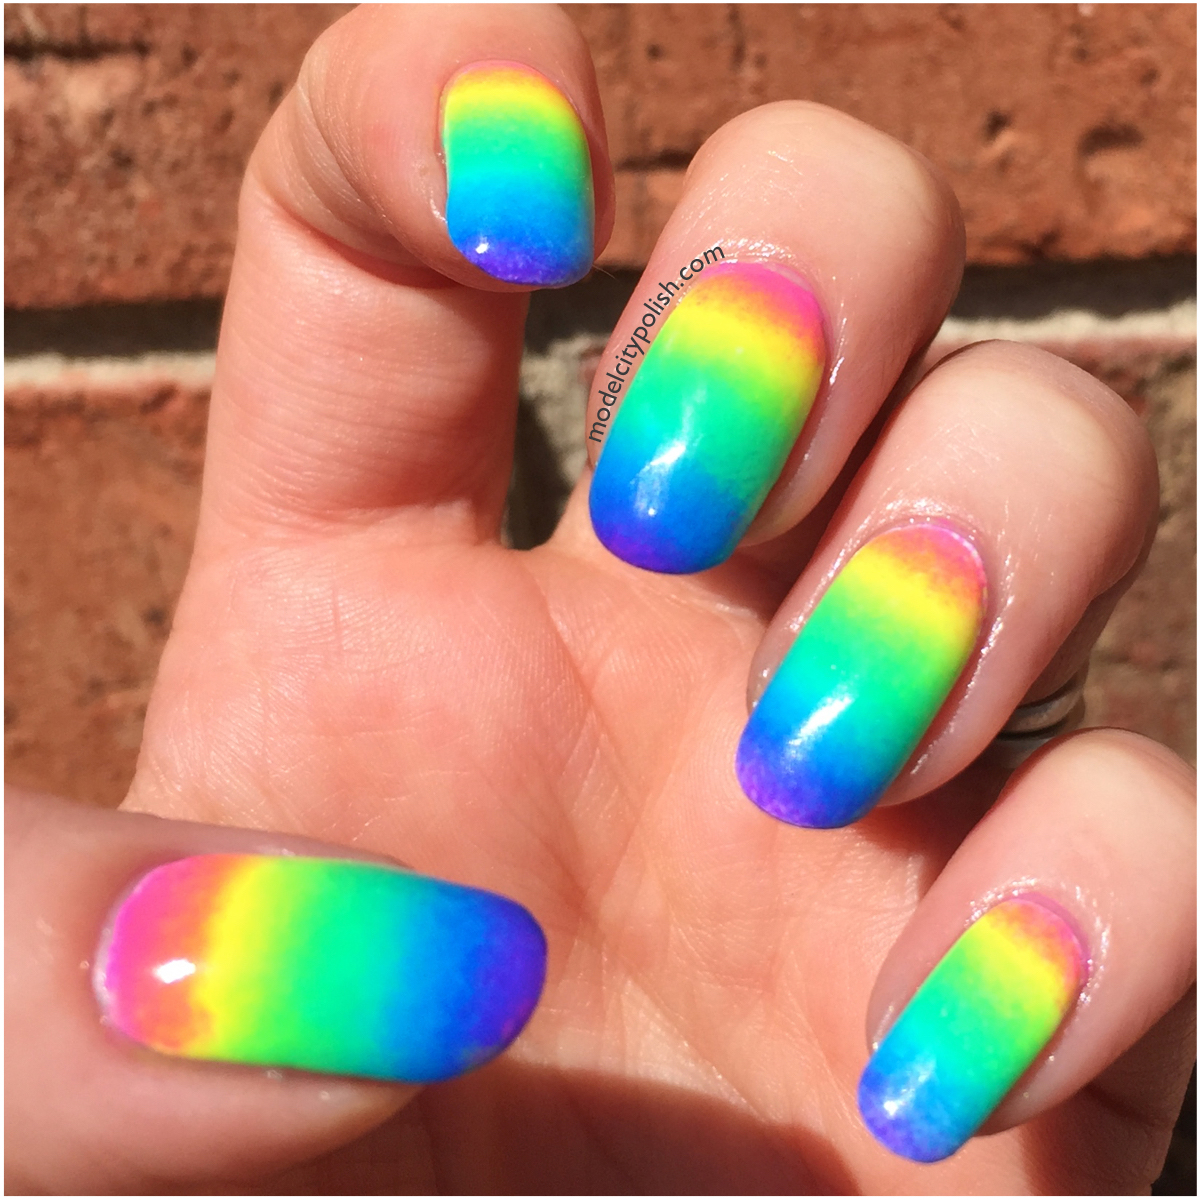 Neon Rainbow with China Glaze